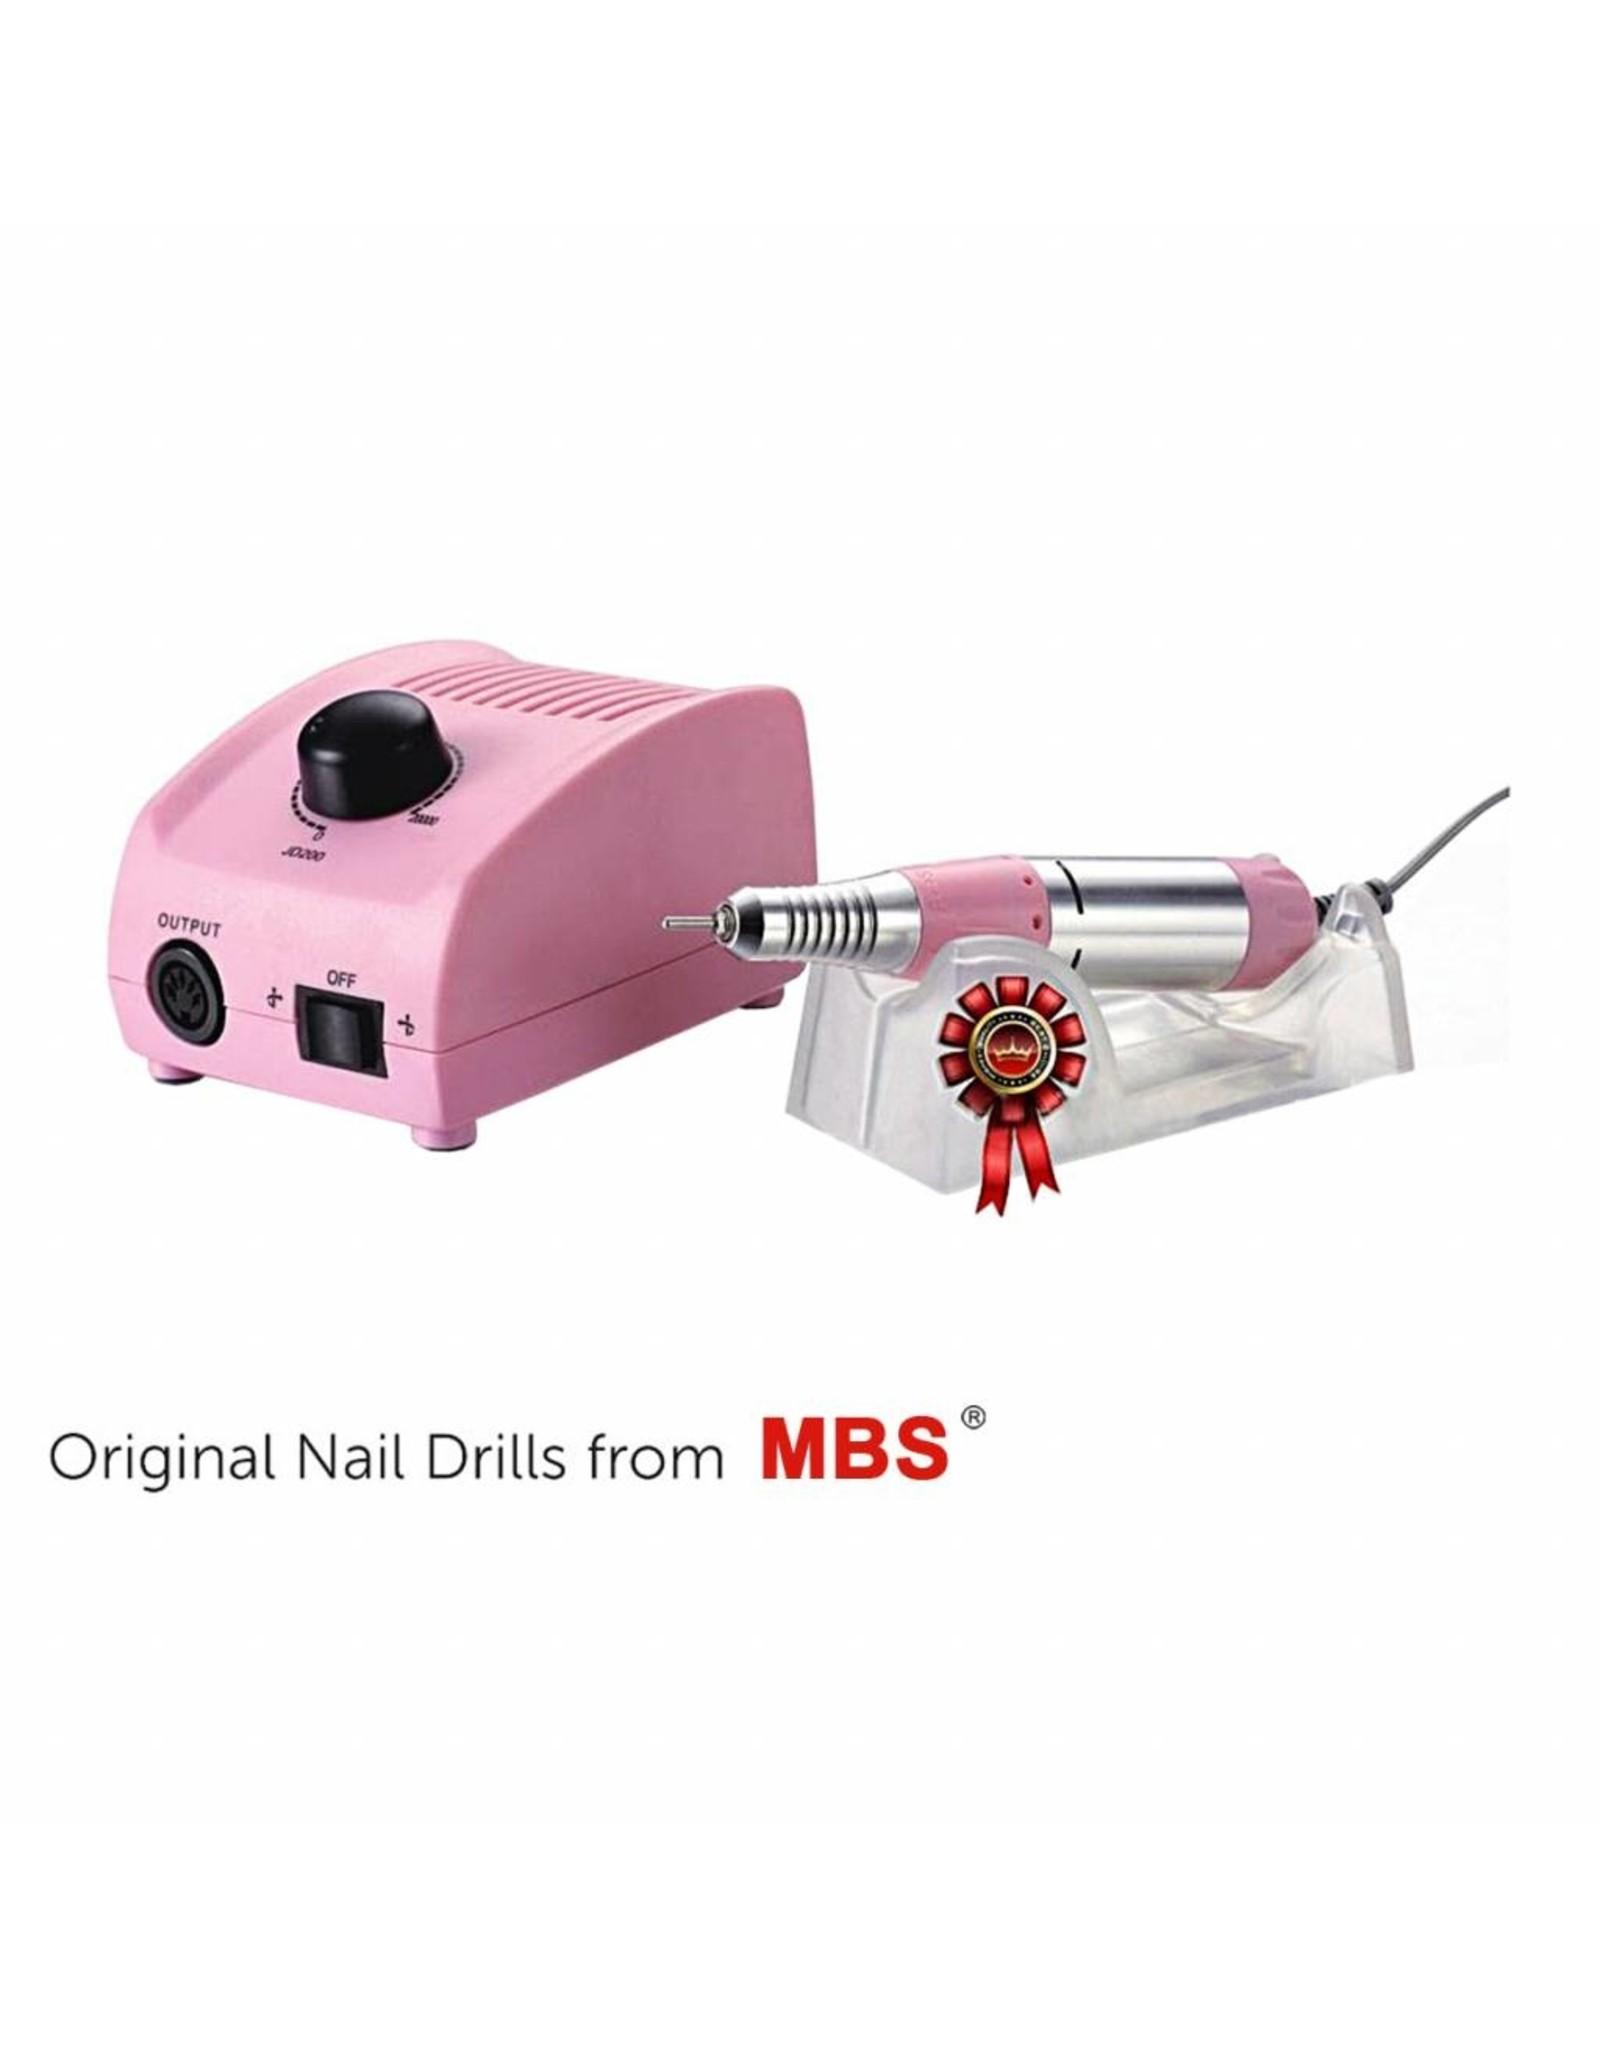 Mega Beauty Shop® Nagelfrees JD200 Roze Originele MBS® + 100 stuks schuurrolletjes!